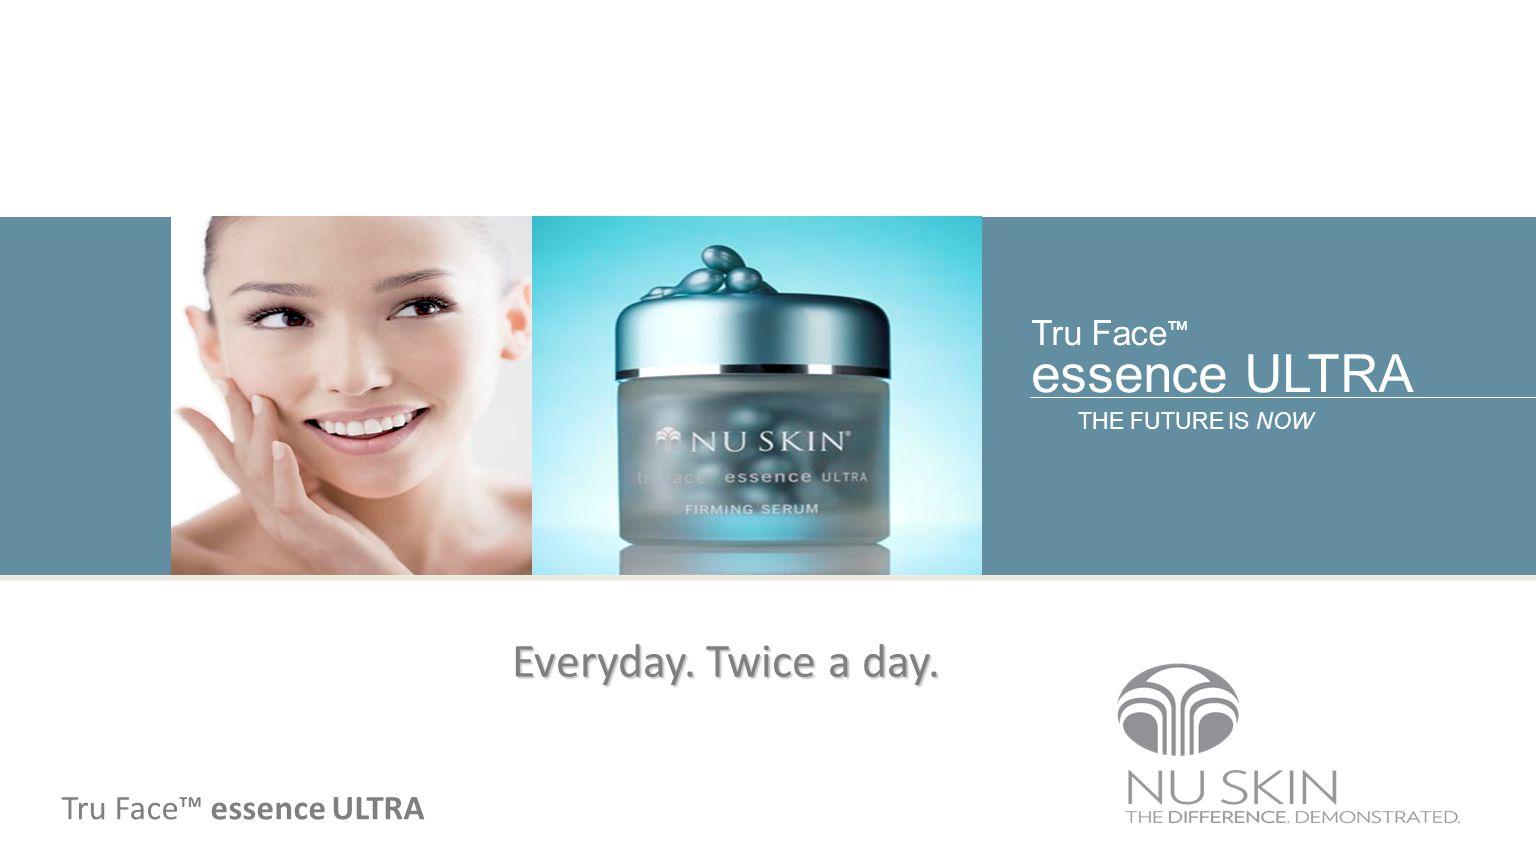 THE FUTURE IS NOW Tru Face essence ULTRA Everyday. Twice a day. Tru Face essence ULTRA